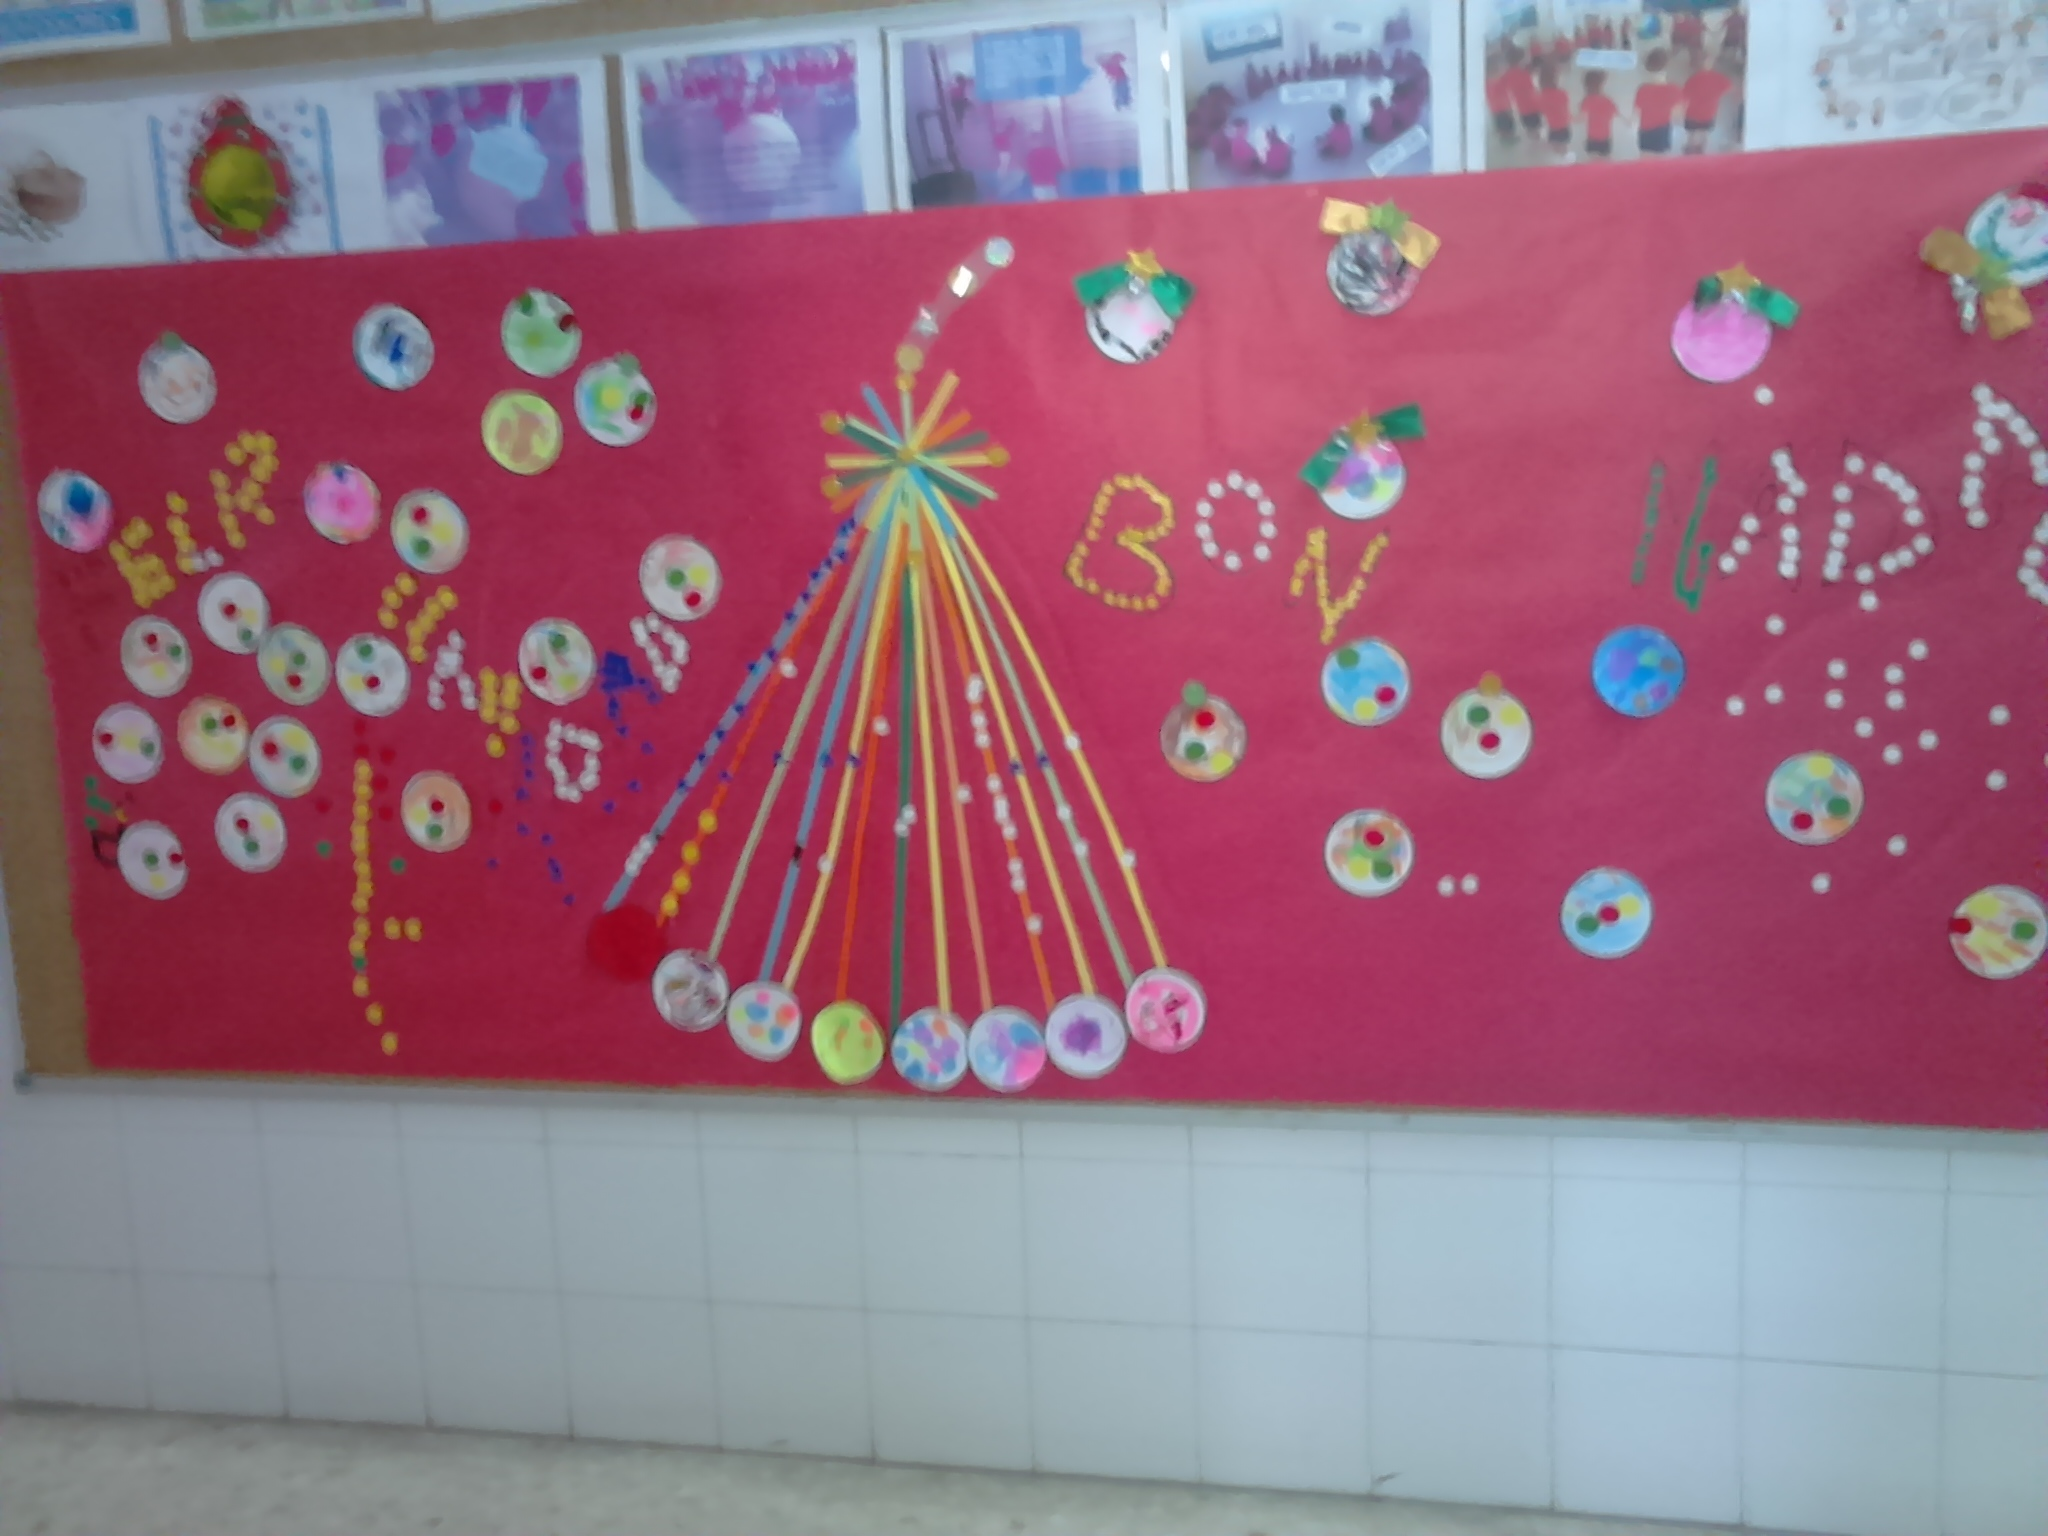 Gregori mayans murals de nadal - Mural navidad infantil ...